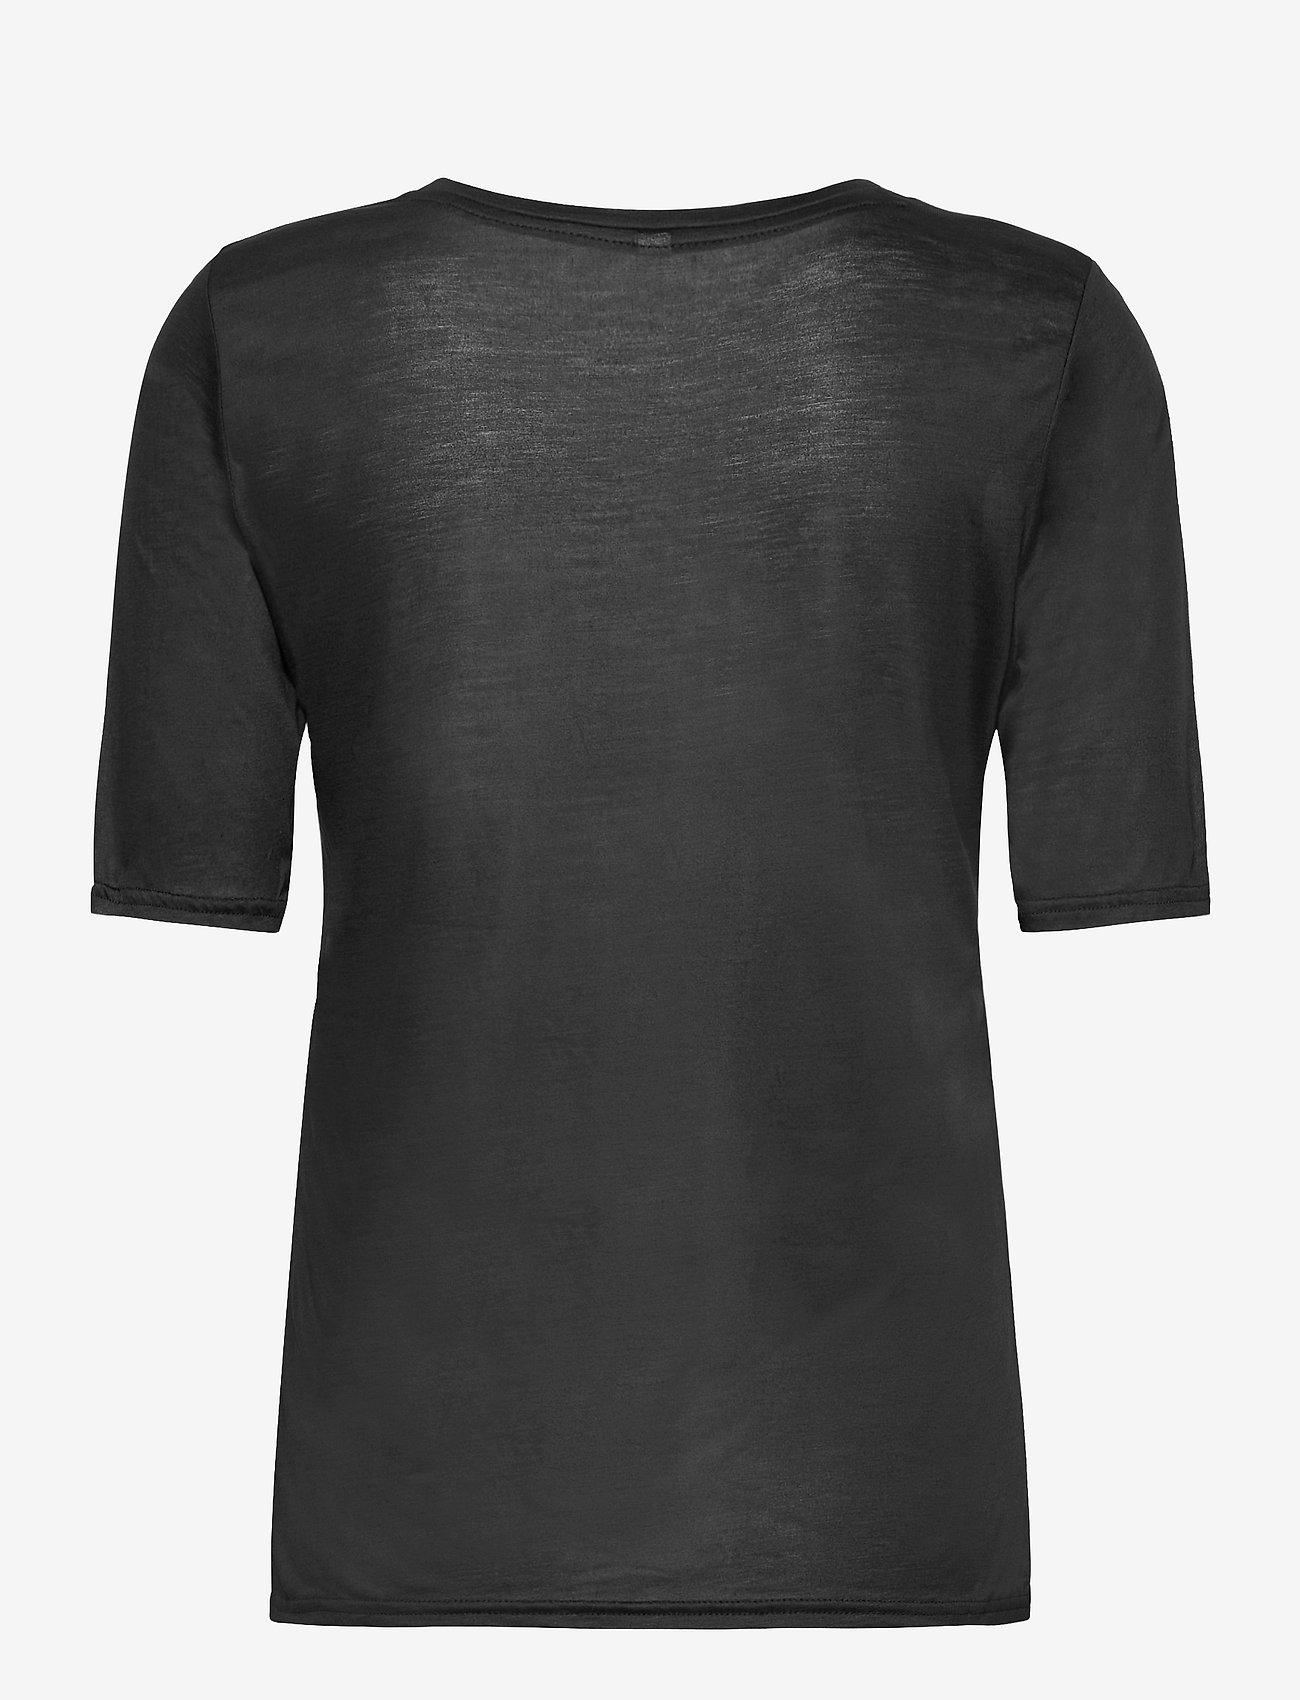 Pulz Jeans - PZCARLA t-shirt - t-shirts - black beauty - 1